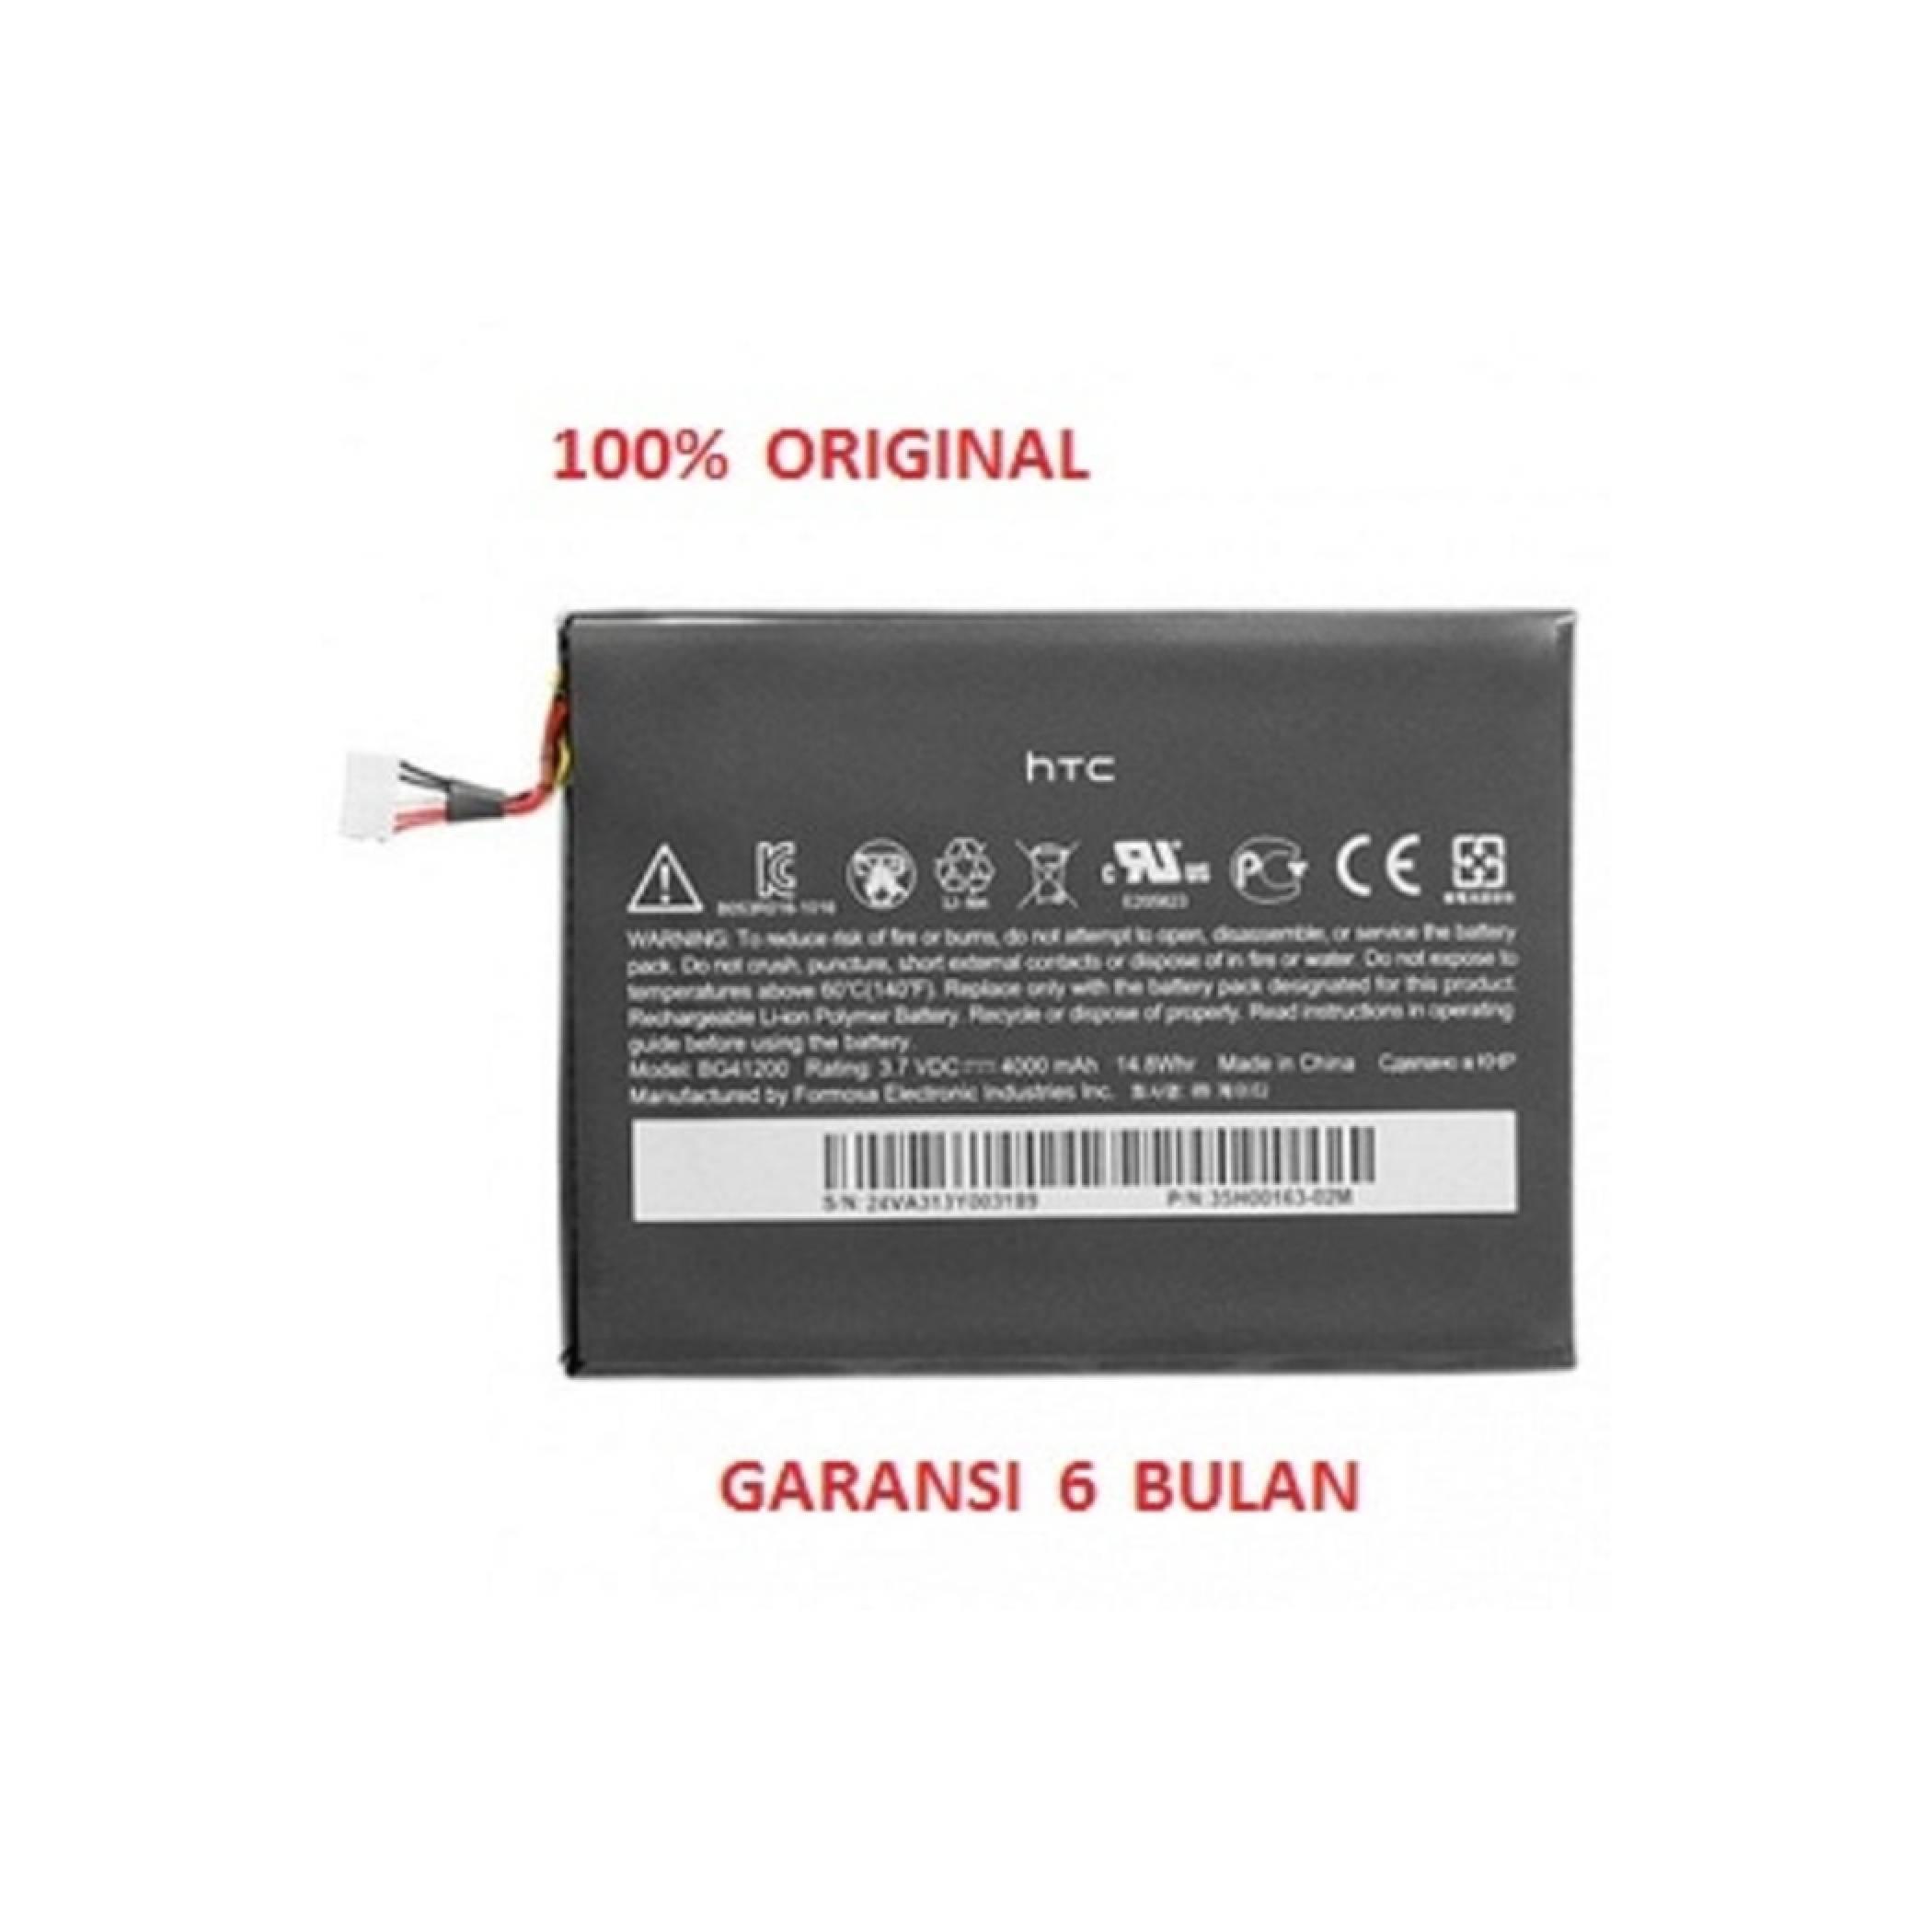 100% ORIGINAL Battery HTC BG41200 / HTC Flyer